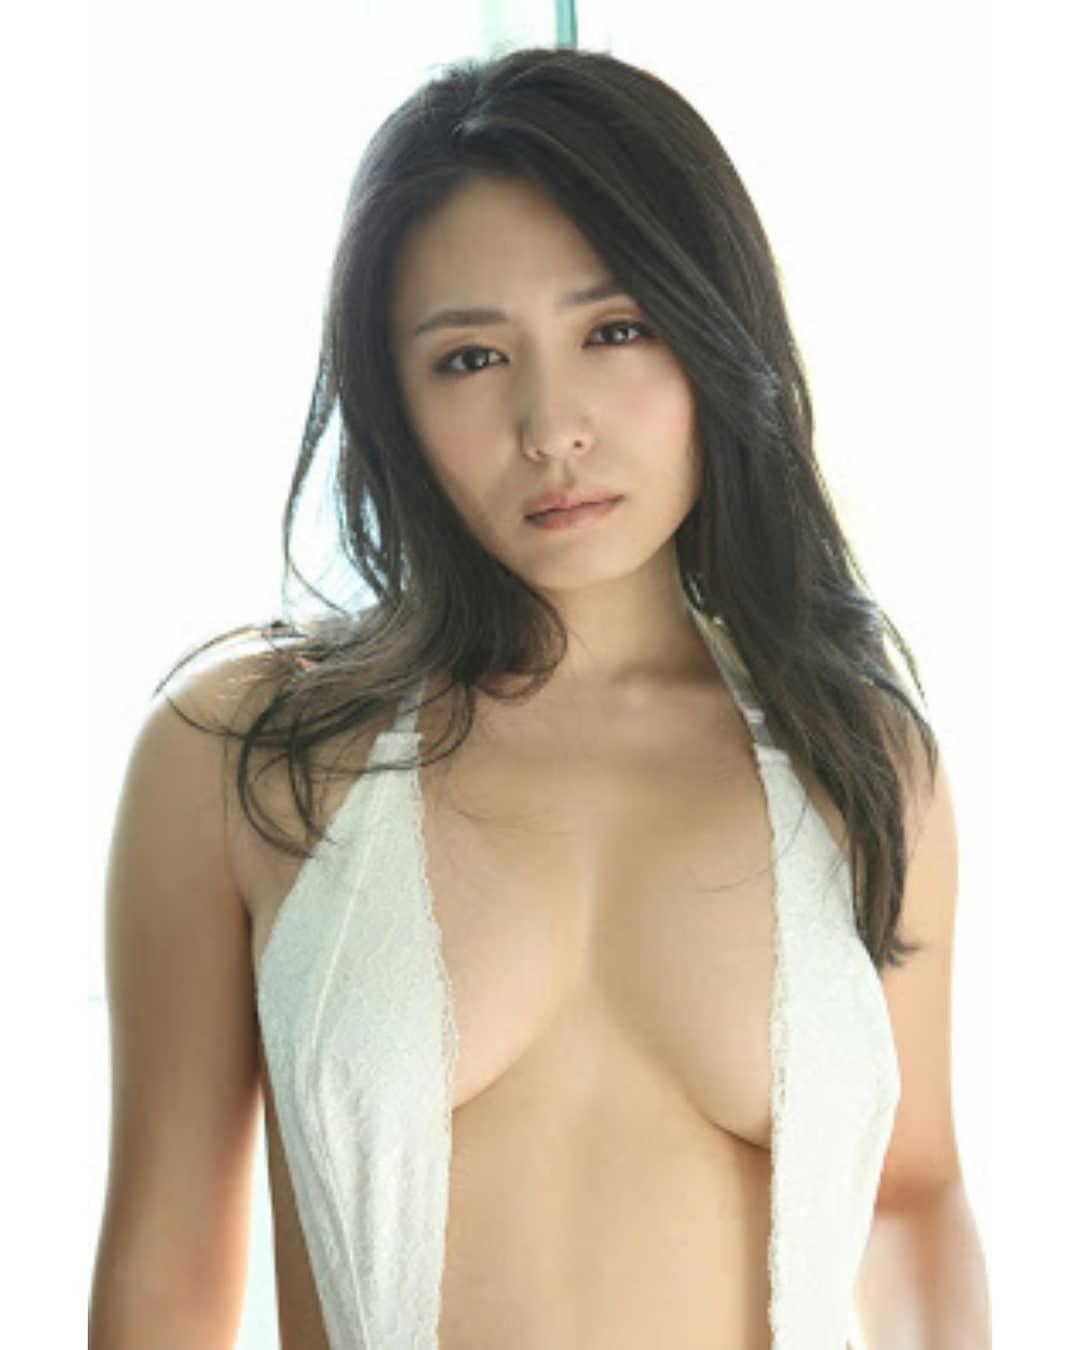 kawamura_yukie176.jpg